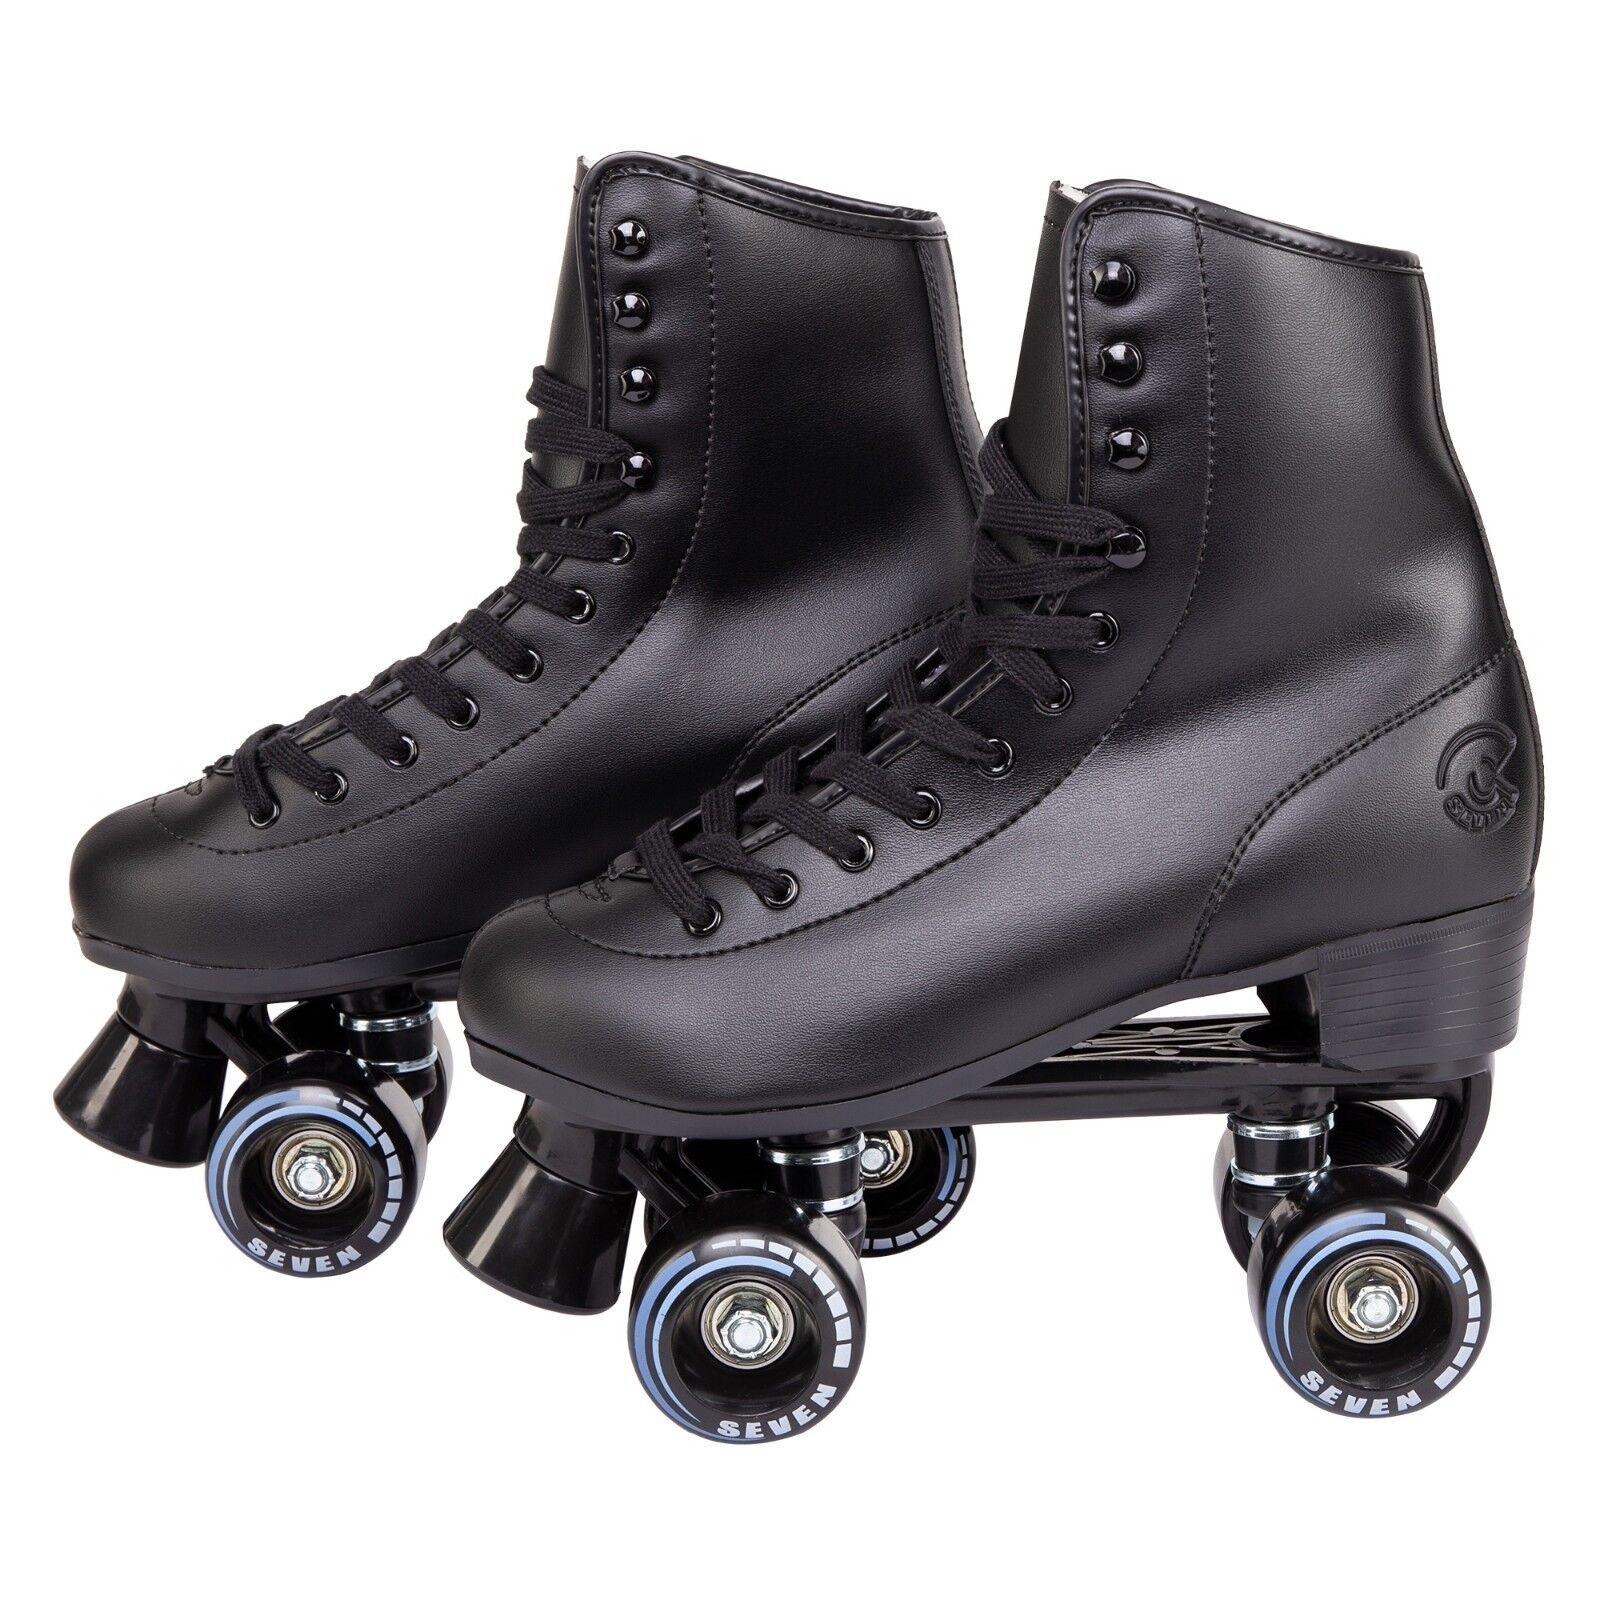 C7 Classic Roller Skates Retro Soft Faux Leder Rink Speedy Men Damens